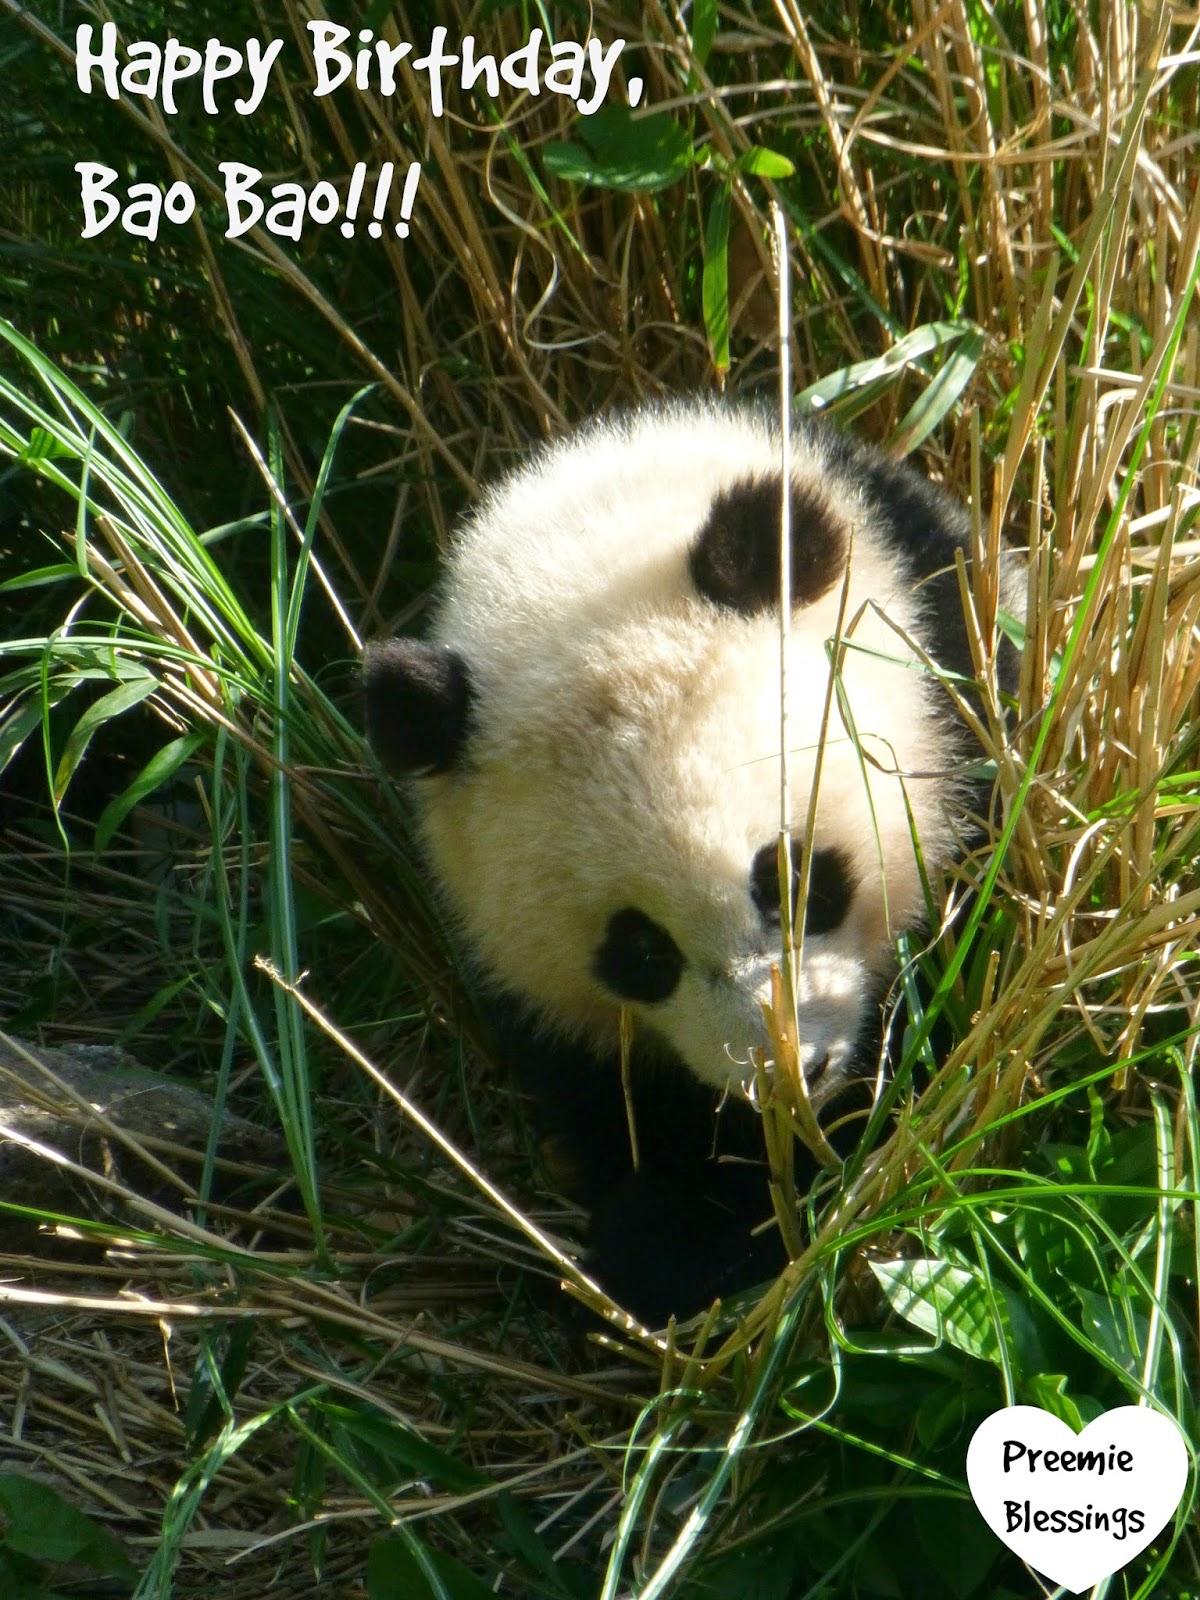 Bao Bao, panda, birthday, National Zoo